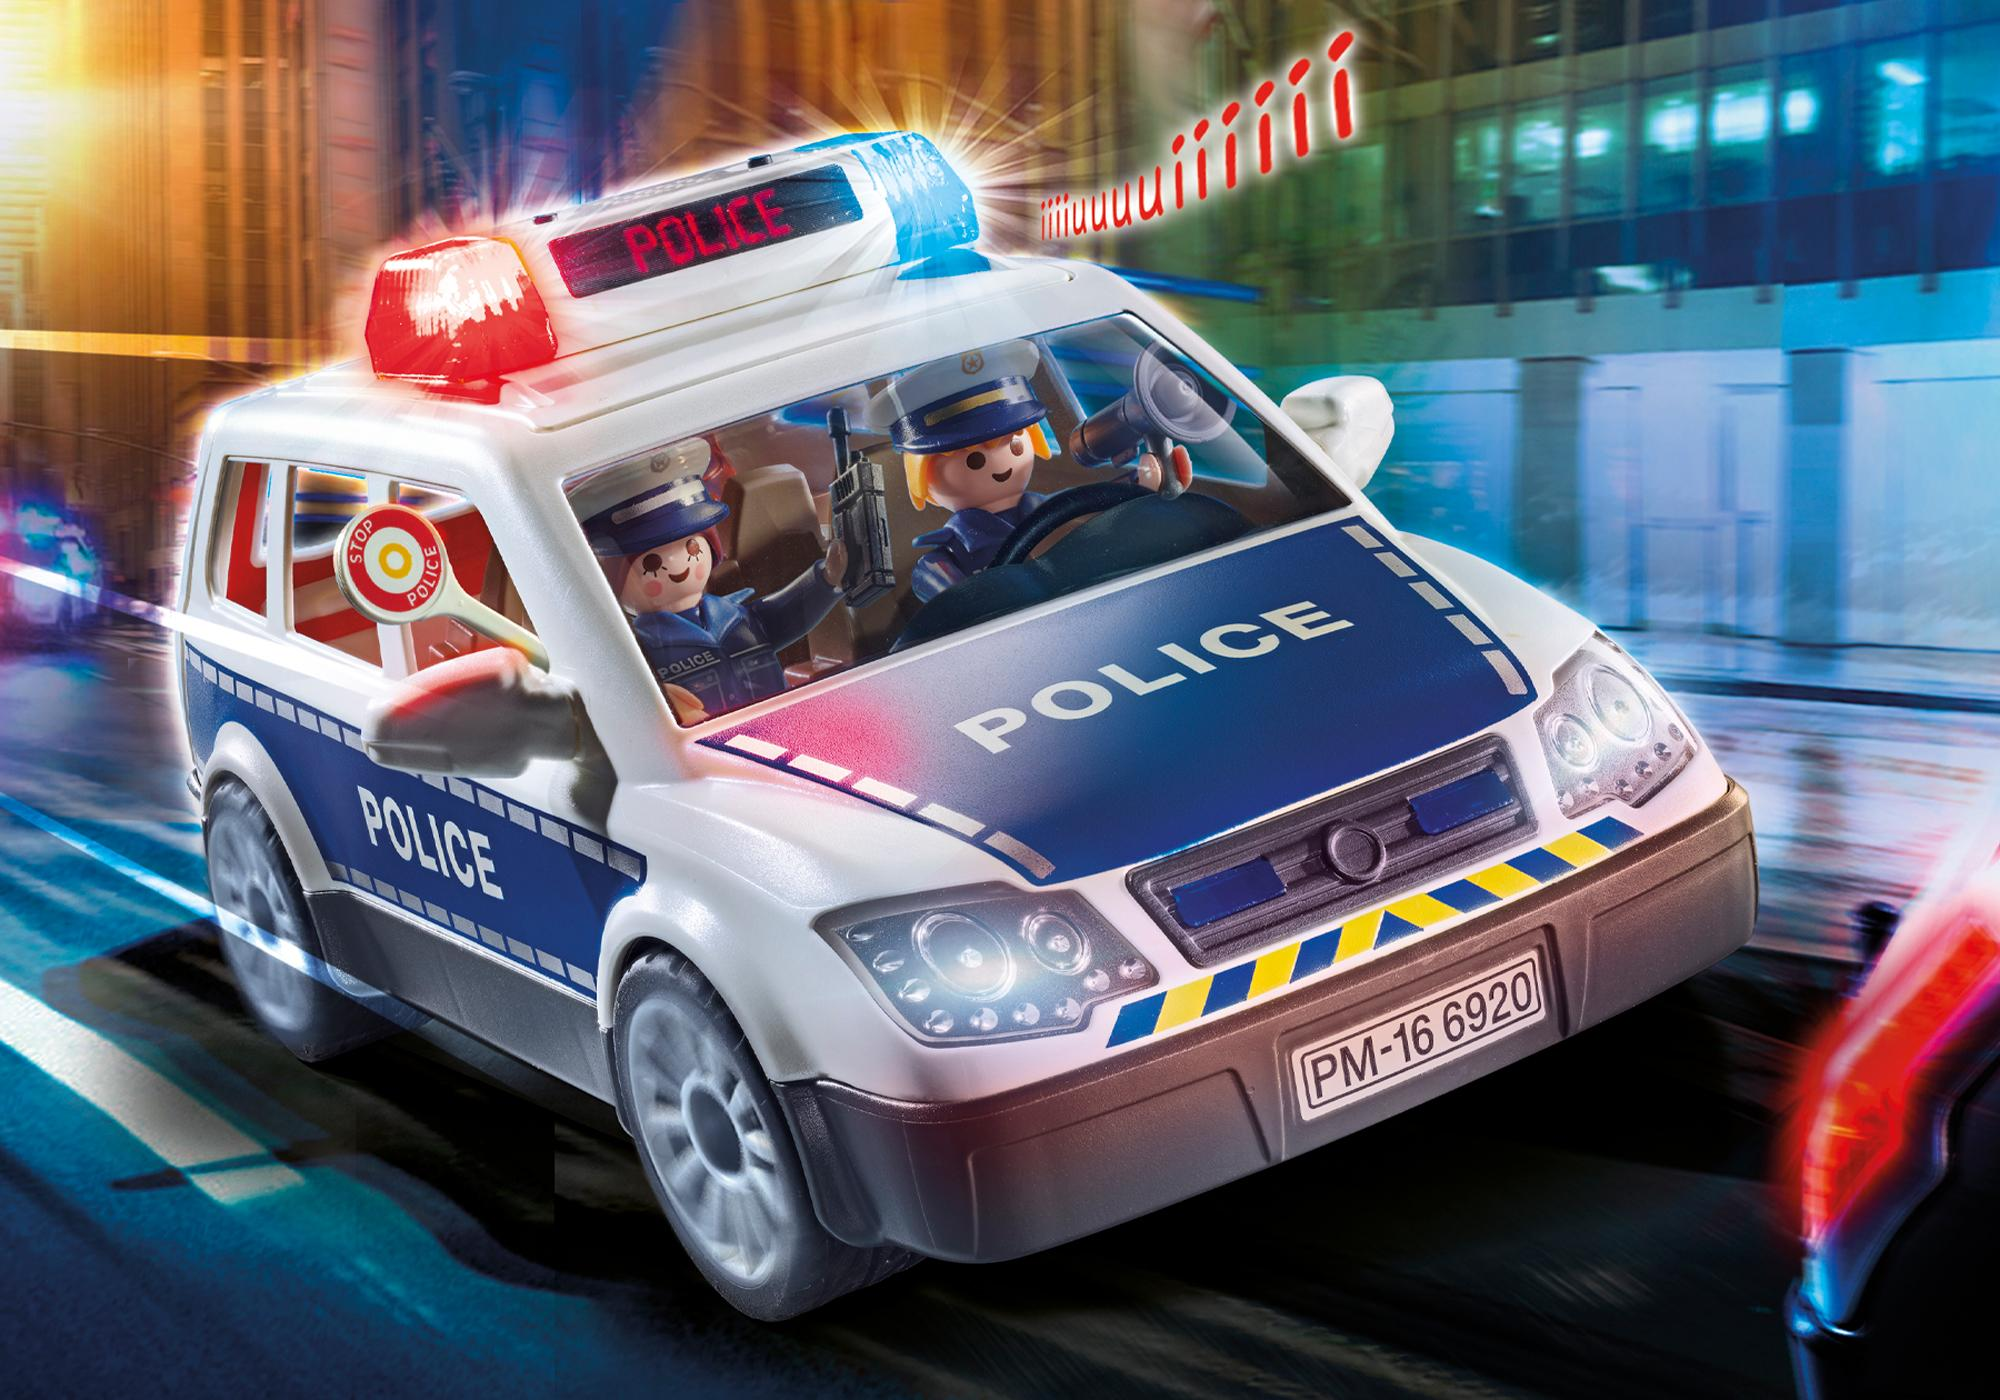 http://media.playmobil.com/i/playmobil/6873_product_detail/Polizei-Einsatzwagen